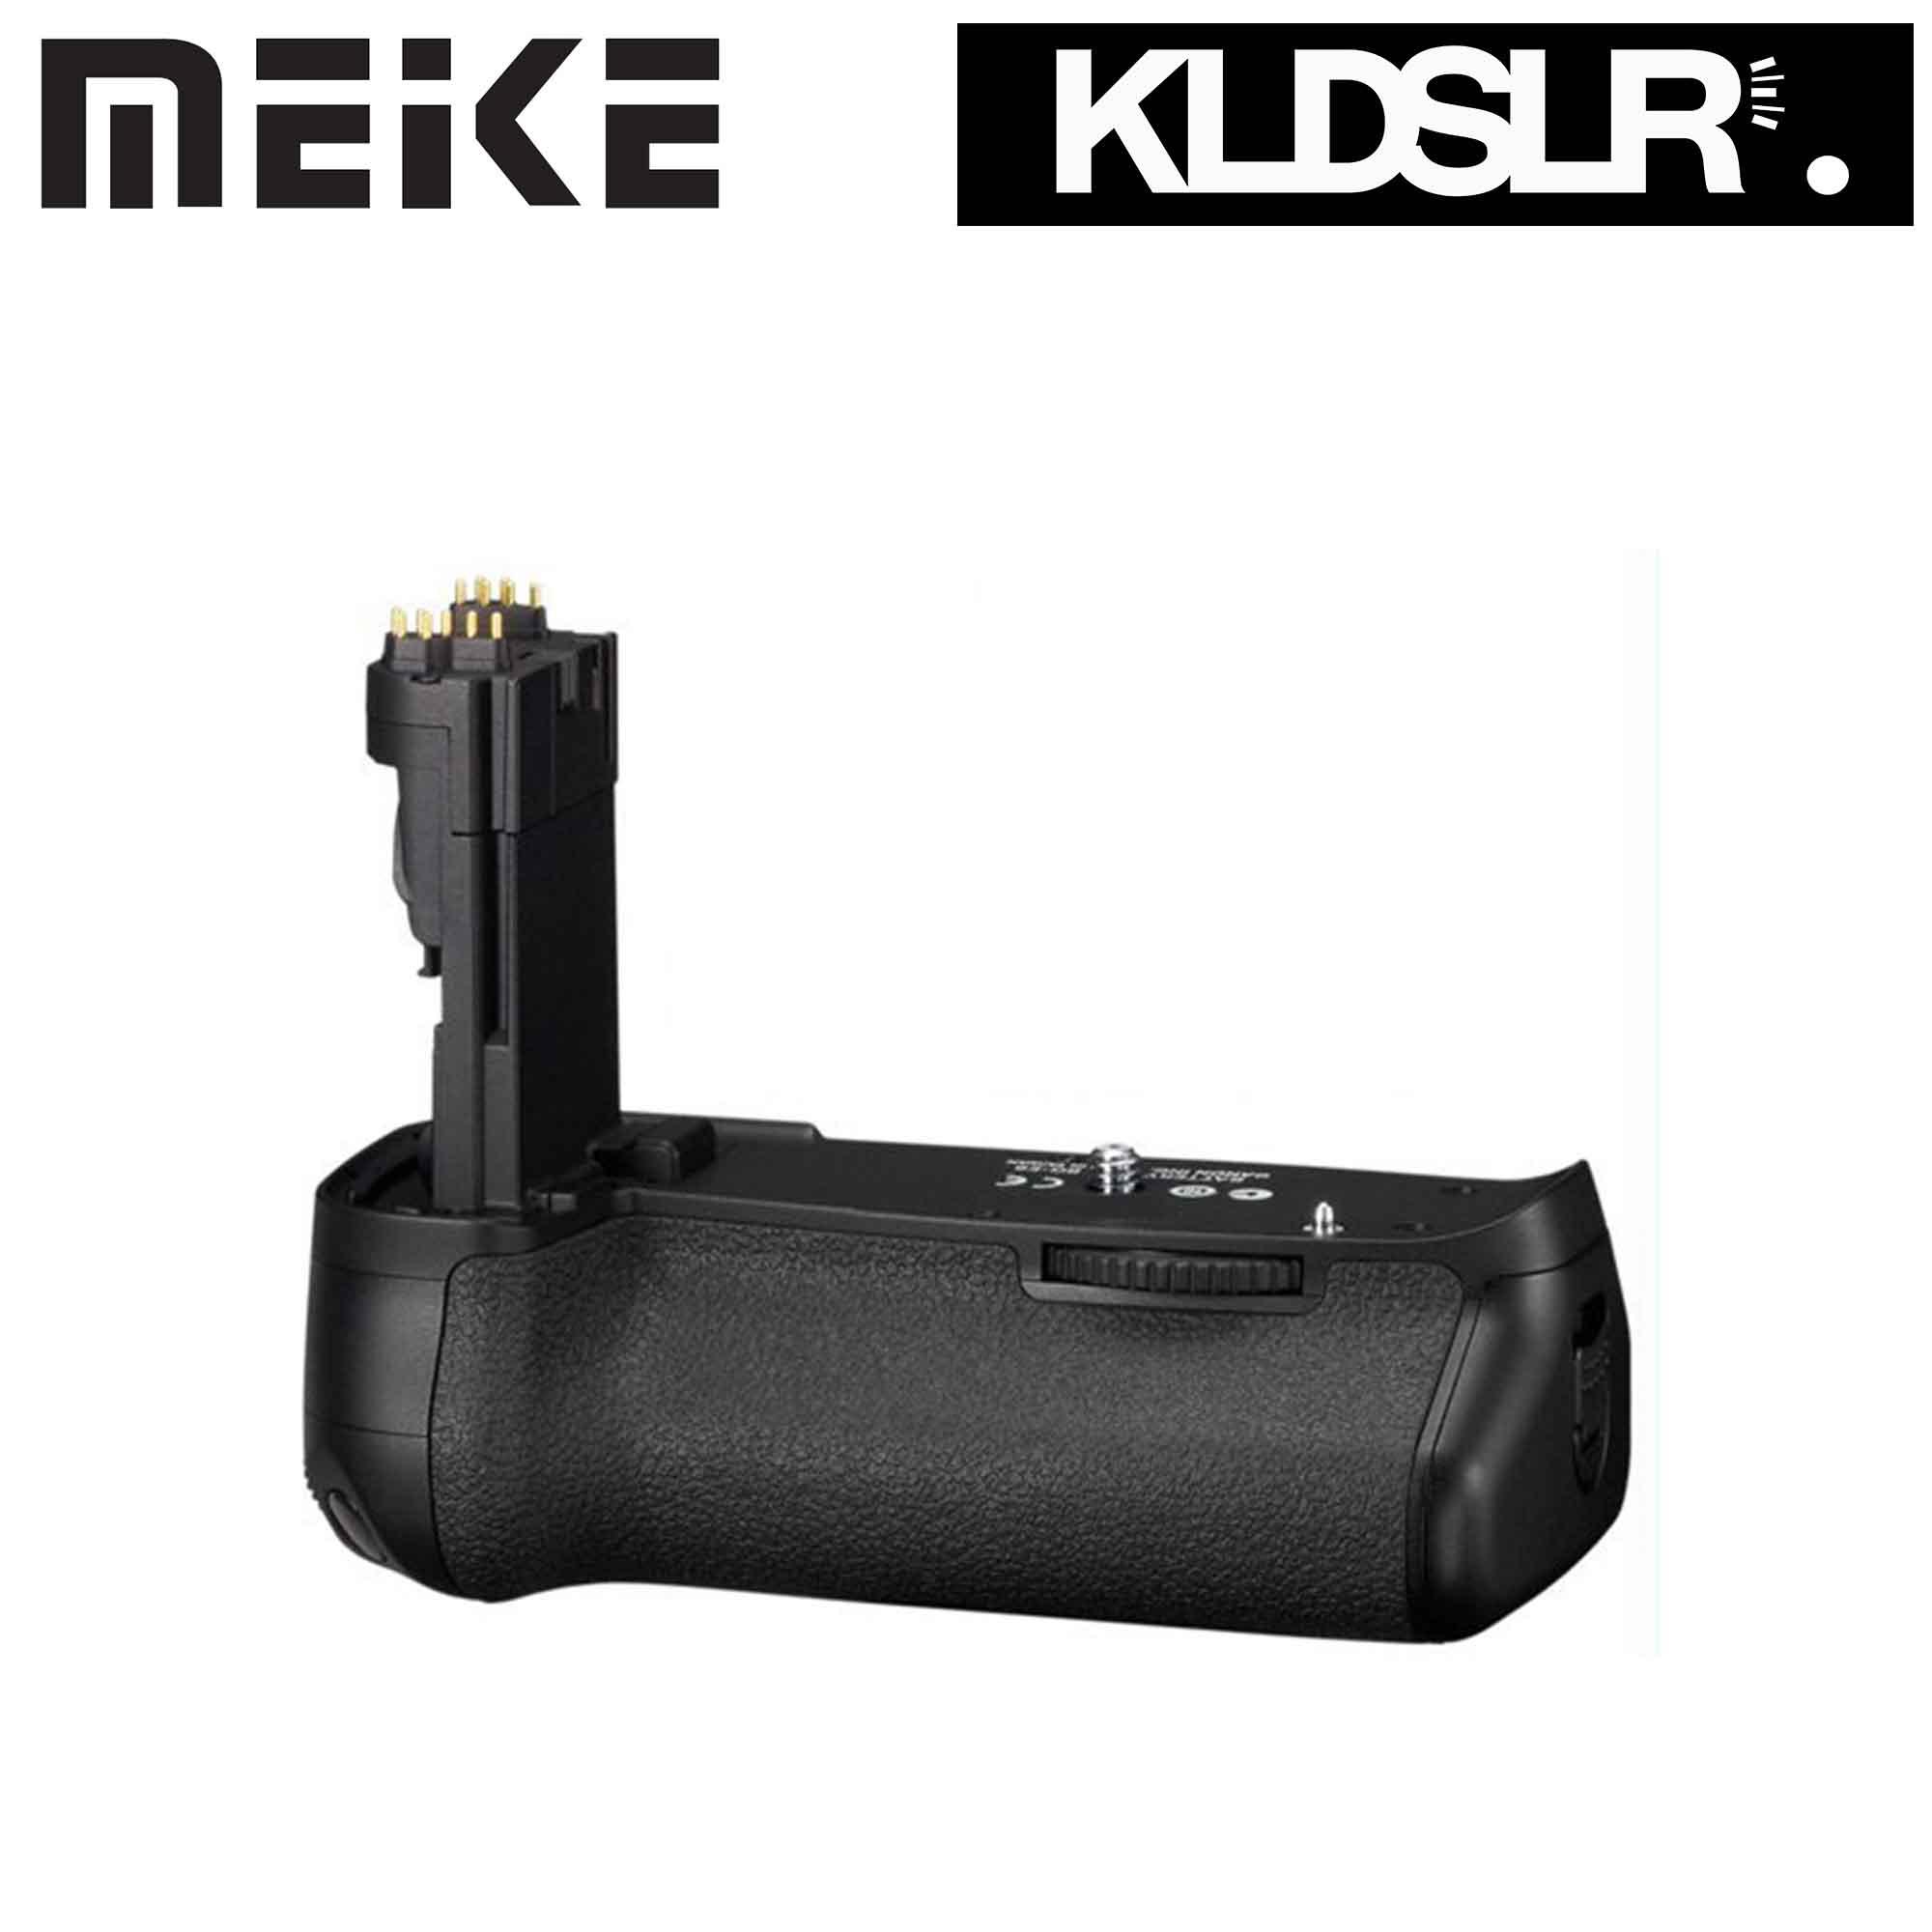 Meike Battery Grip For Canon Eos 1100d Rebel T3 Lp E10 Camera